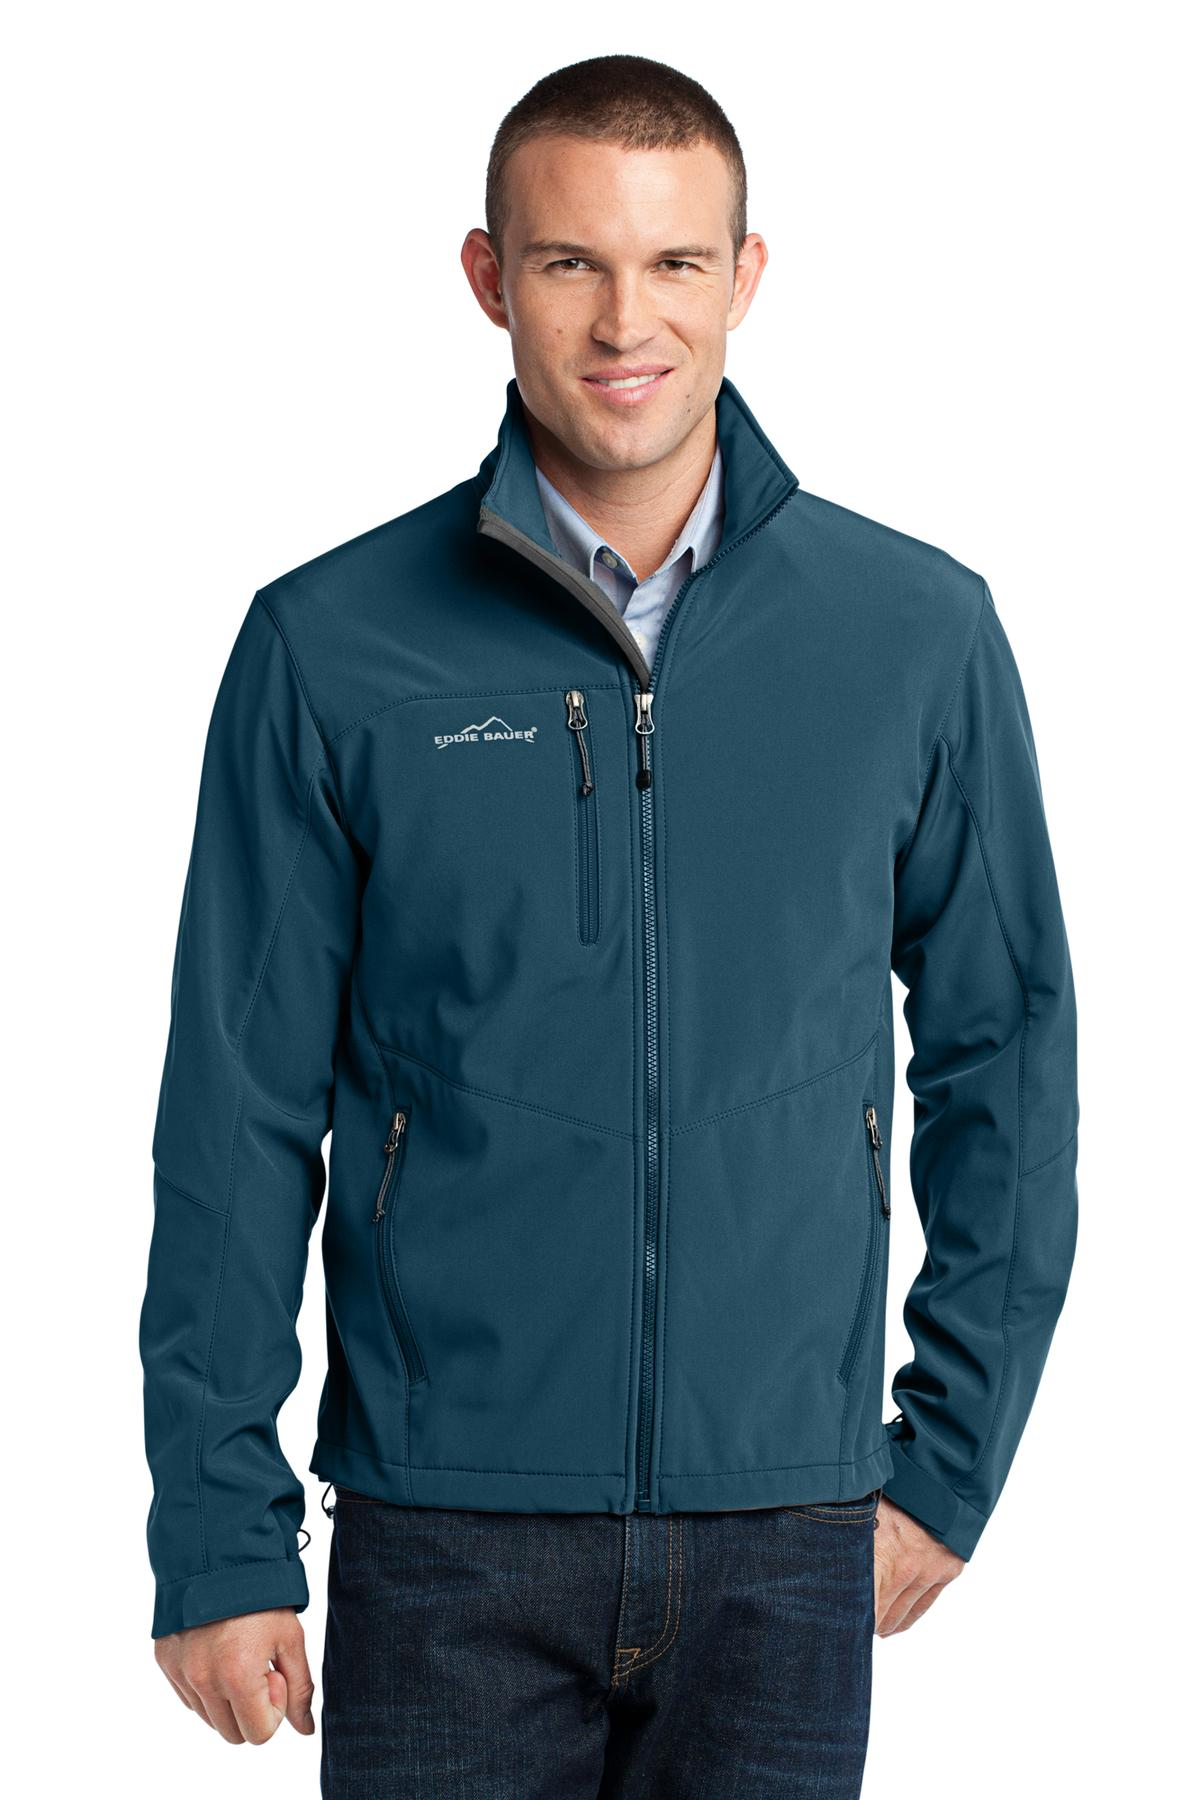 Eddie Bauer - Soft Shell Jacket. EB530